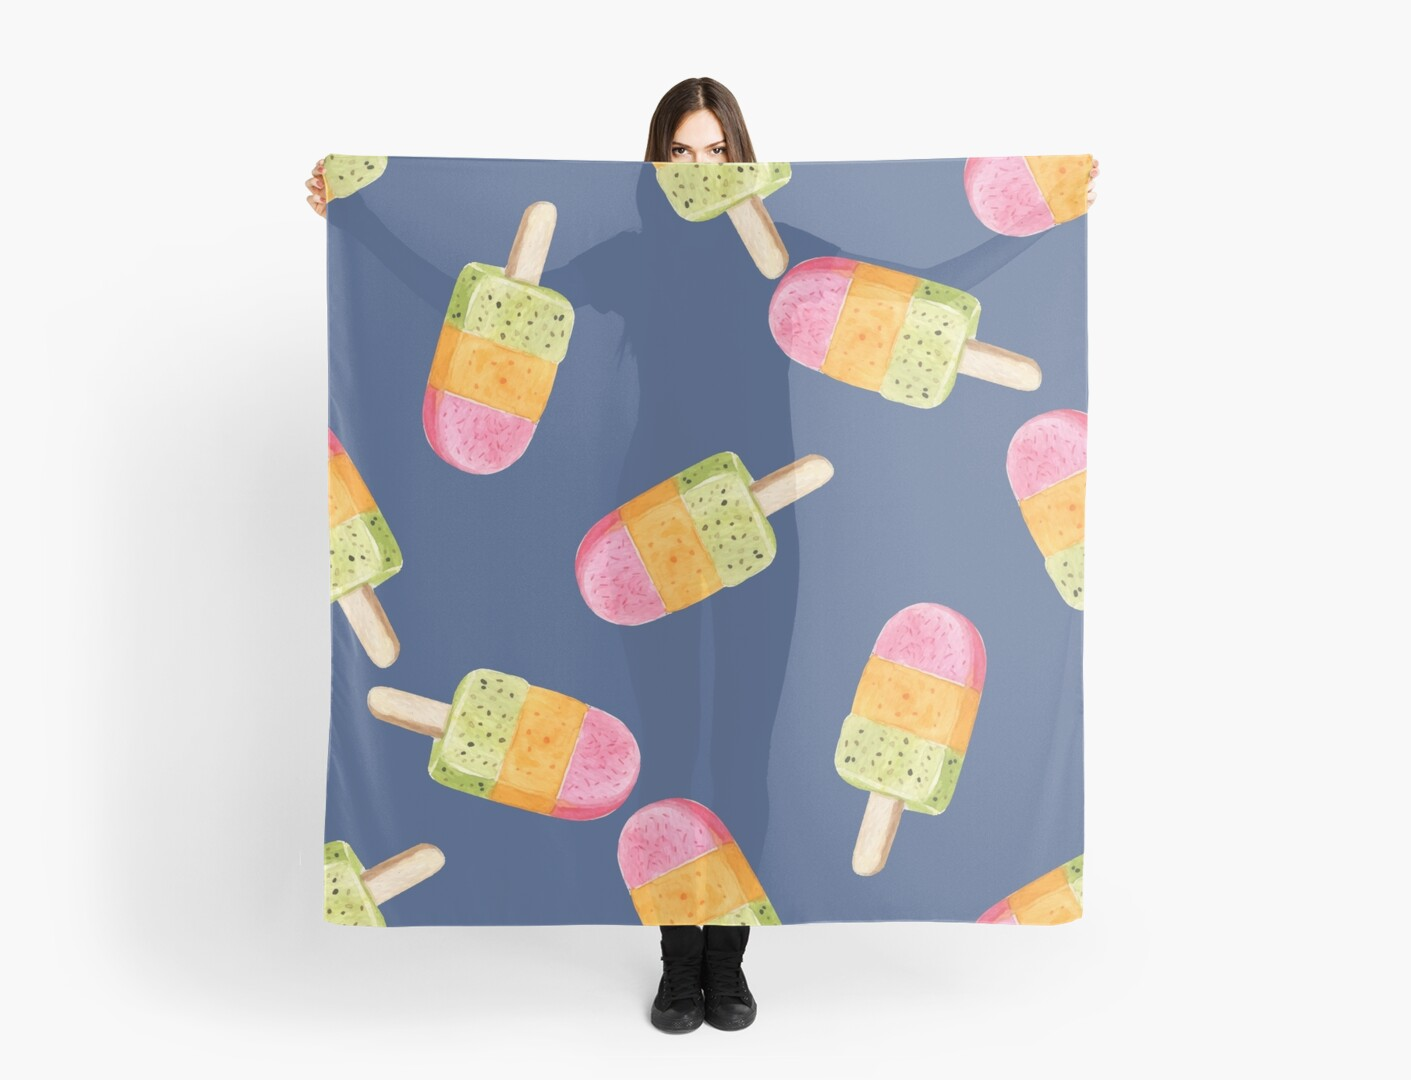 watercolor icecream popsicle seamless pattern by julkapulka